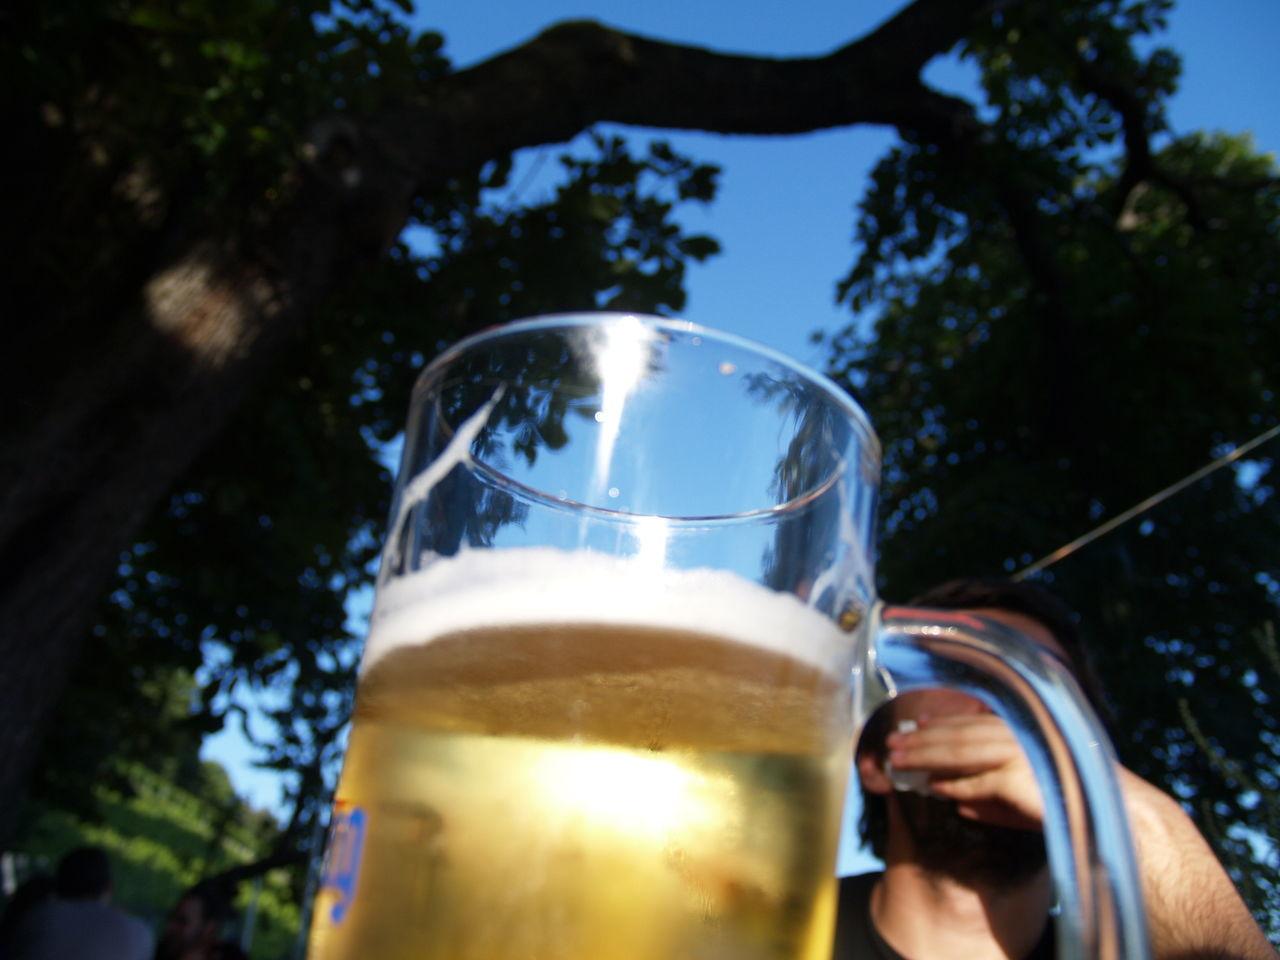 Photos of Freiburg, Germany 2007 Beer Beer Glass Beer Mug Half Full Half Full Or Half Empty? Mug Sun Sunshine Lieblingsteil